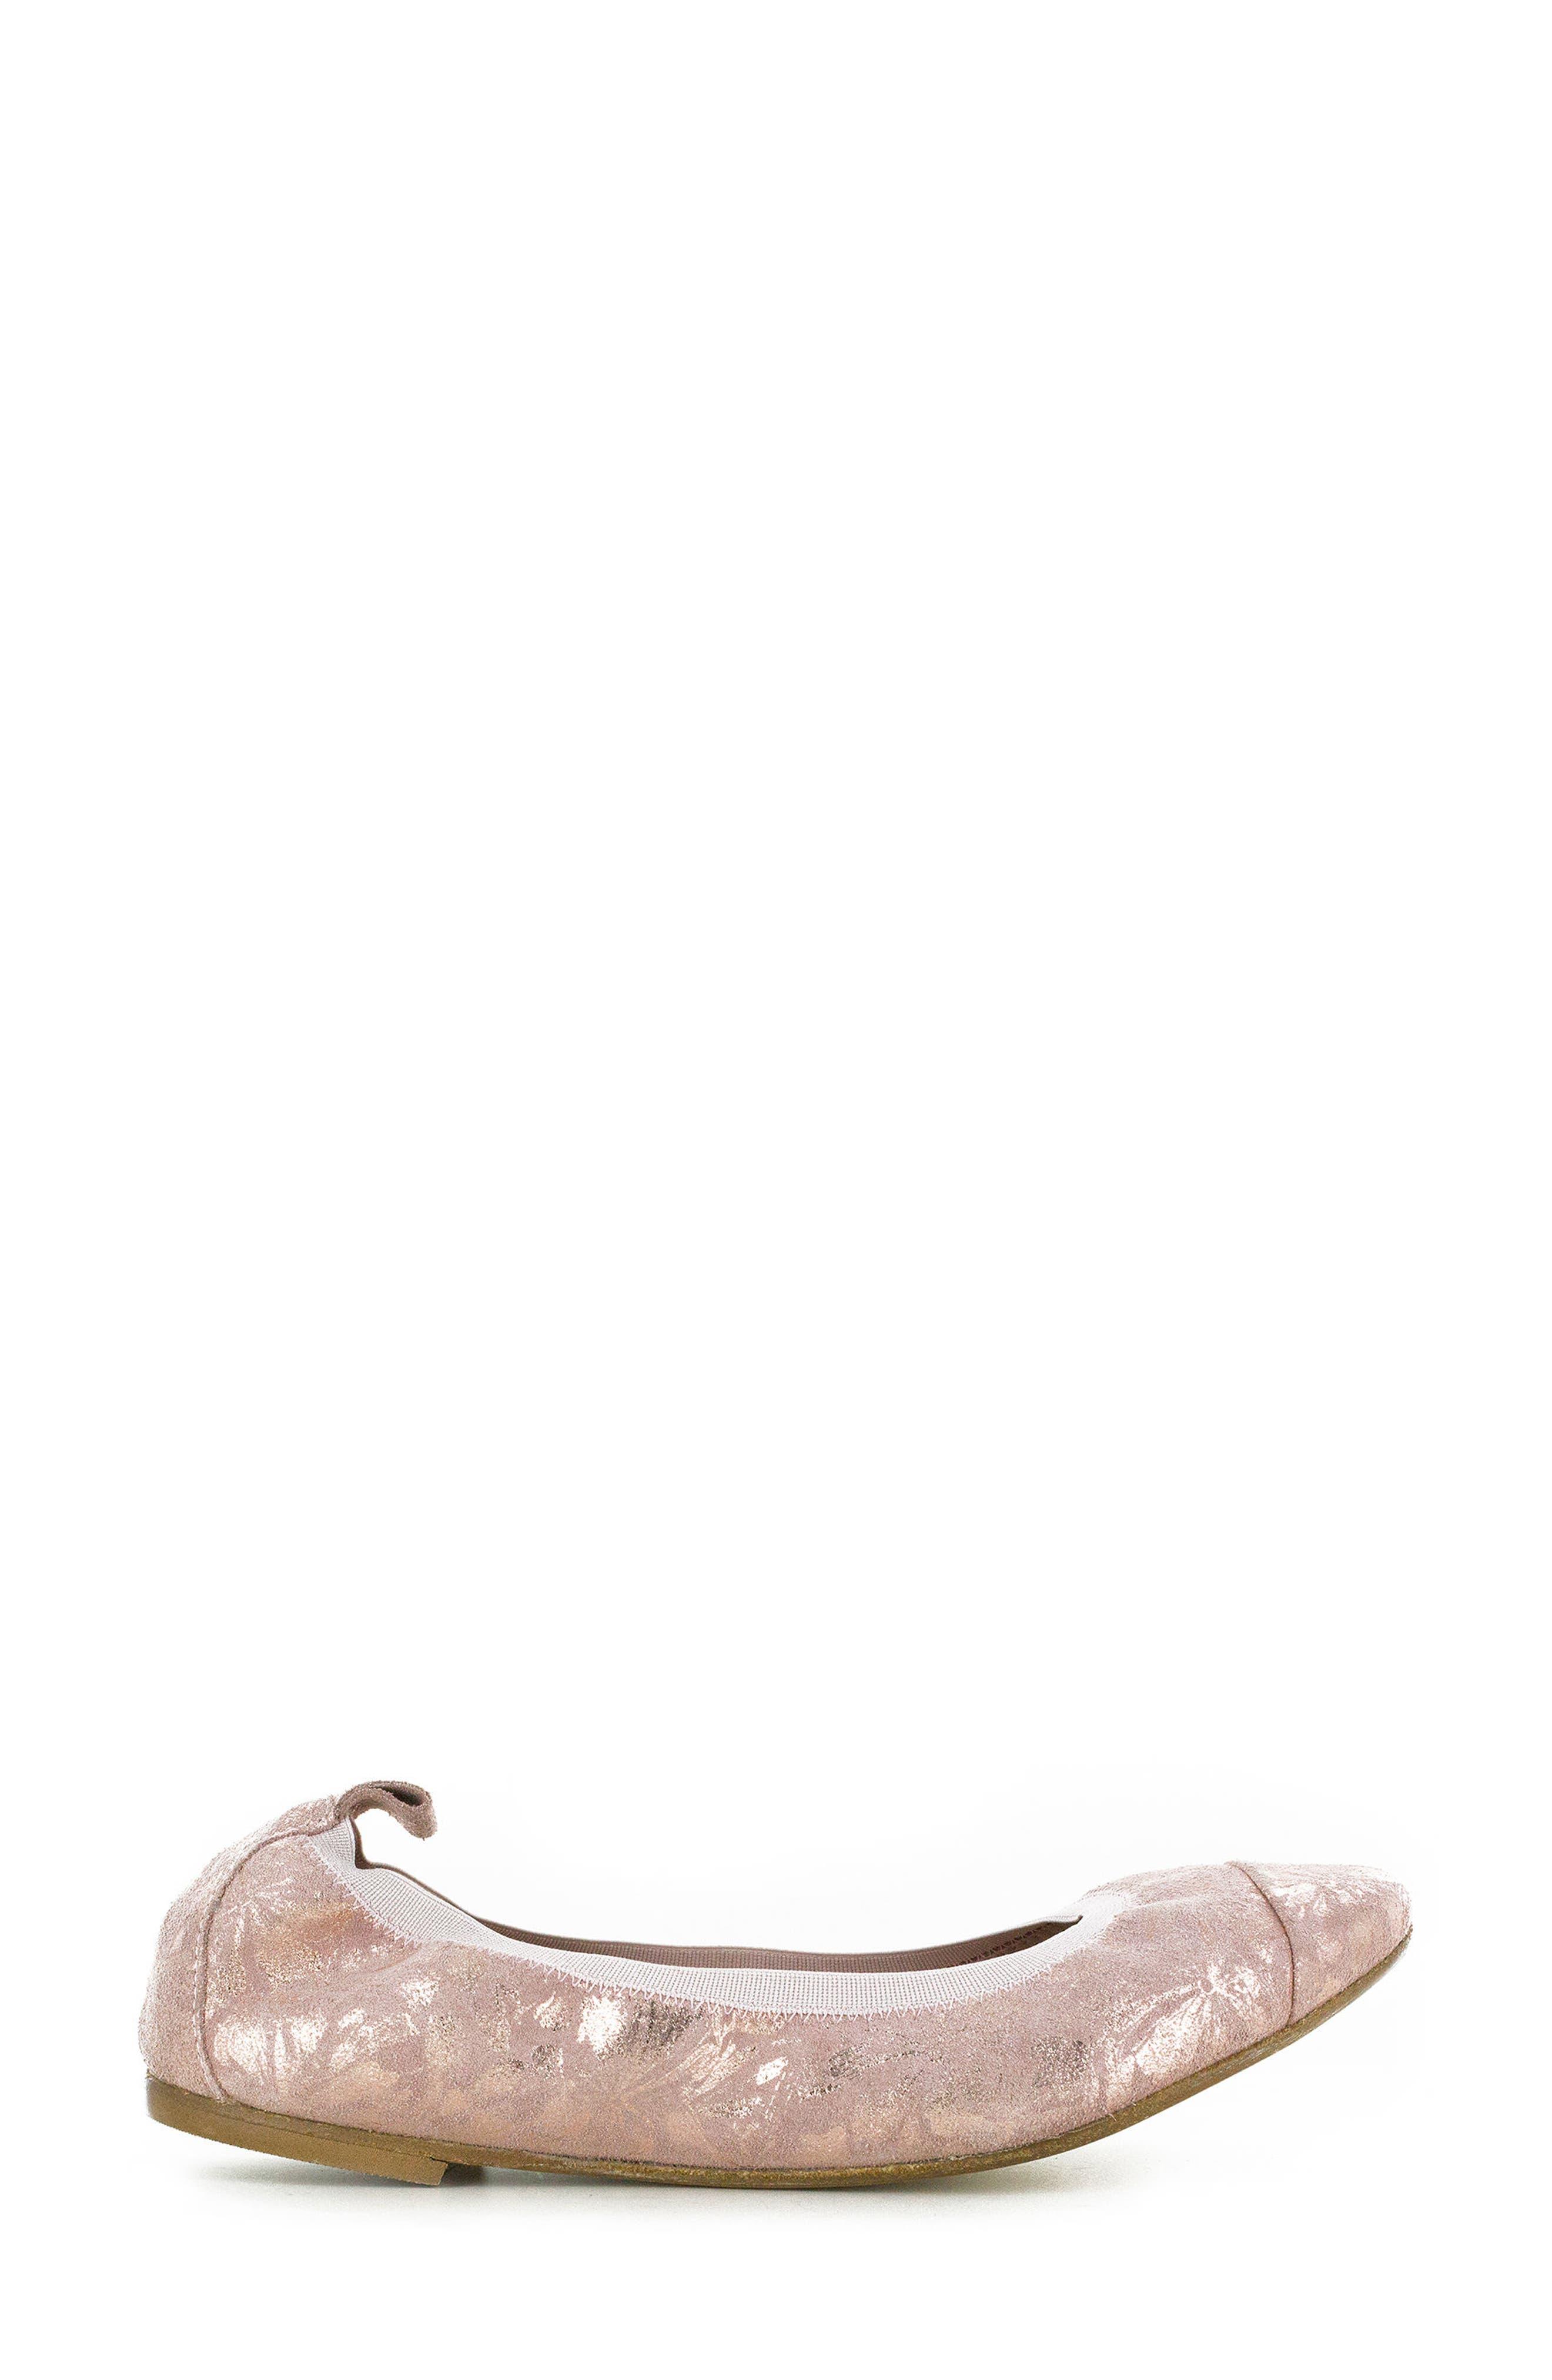 Kara Ballet Flat,                             Alternate thumbnail 3, color,                             Rose Quartz Floral Leather